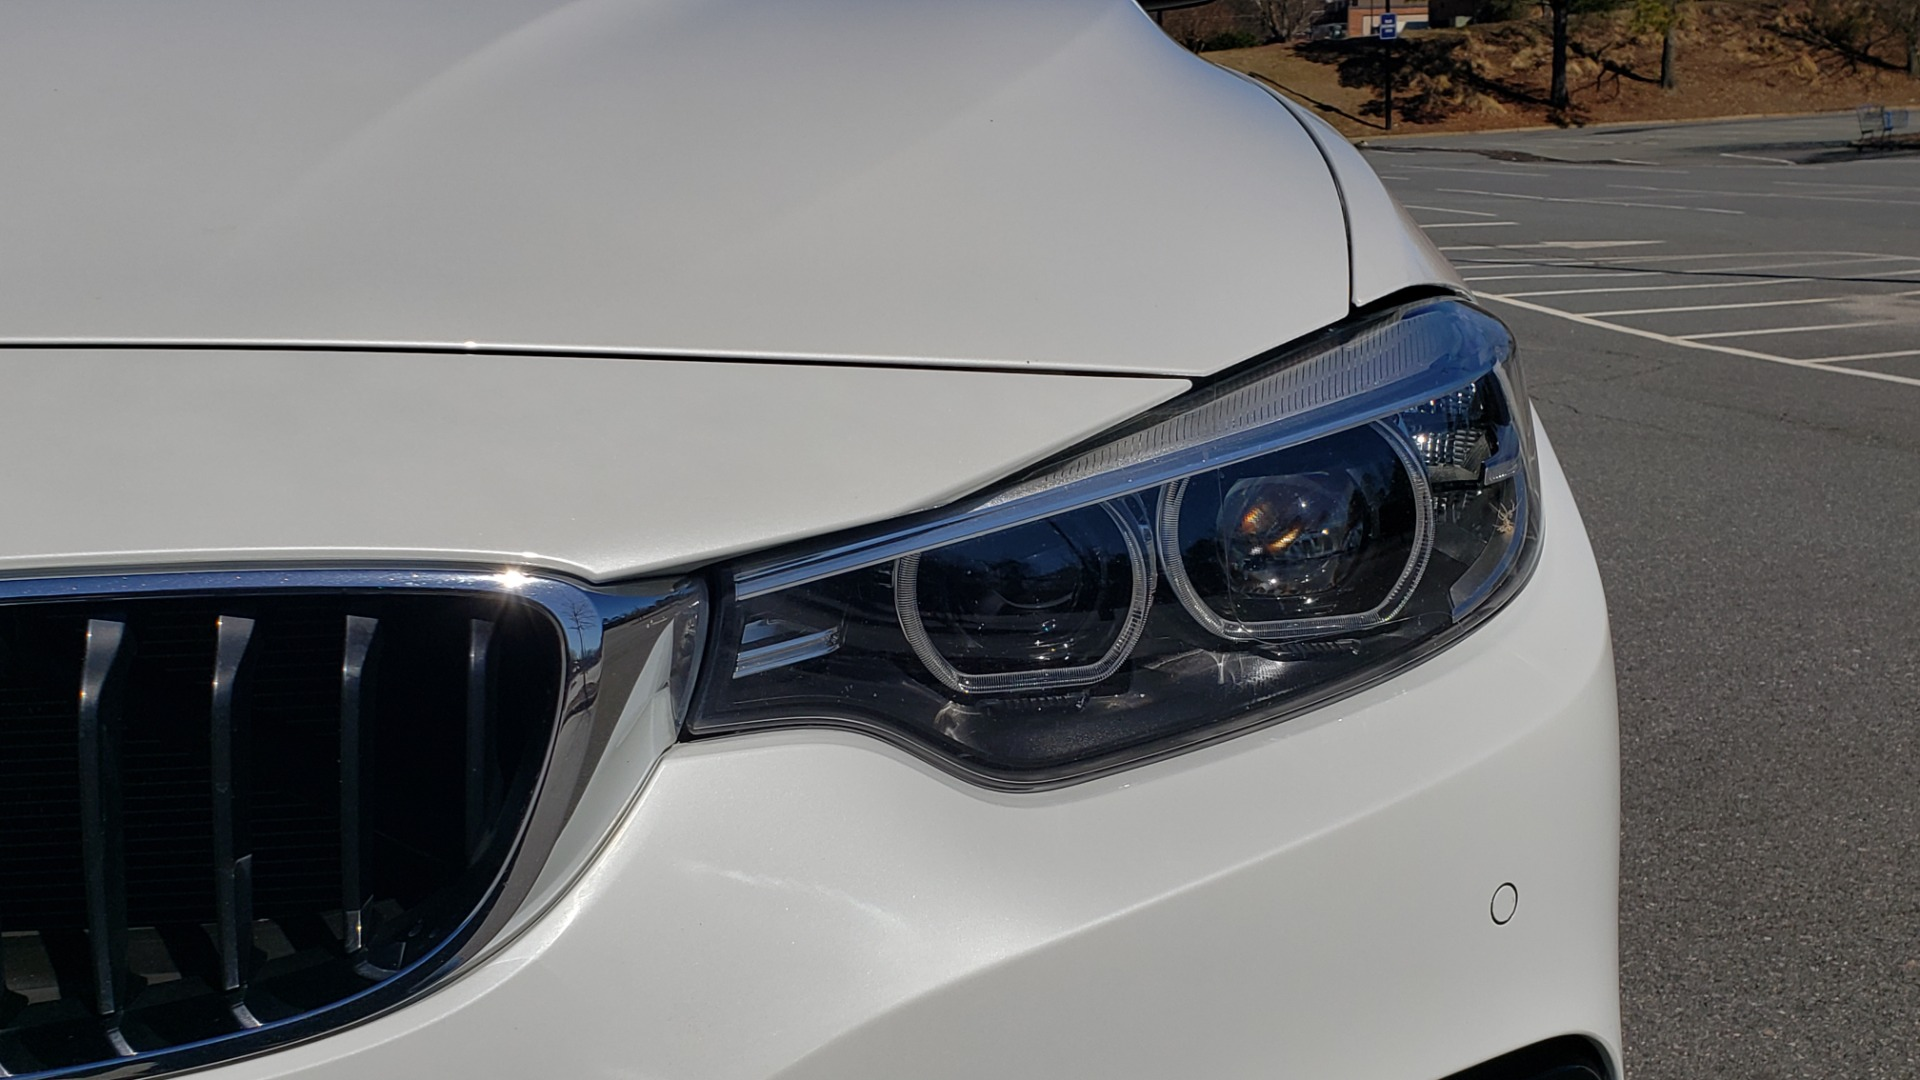 Used 2018 BMW 4 SERIES 430IXDRIVE / PREMIUM / NAV / SUNROOF / ESSENTIALS PKG for sale $27,795 at Formula Imports in Charlotte NC 28227 29